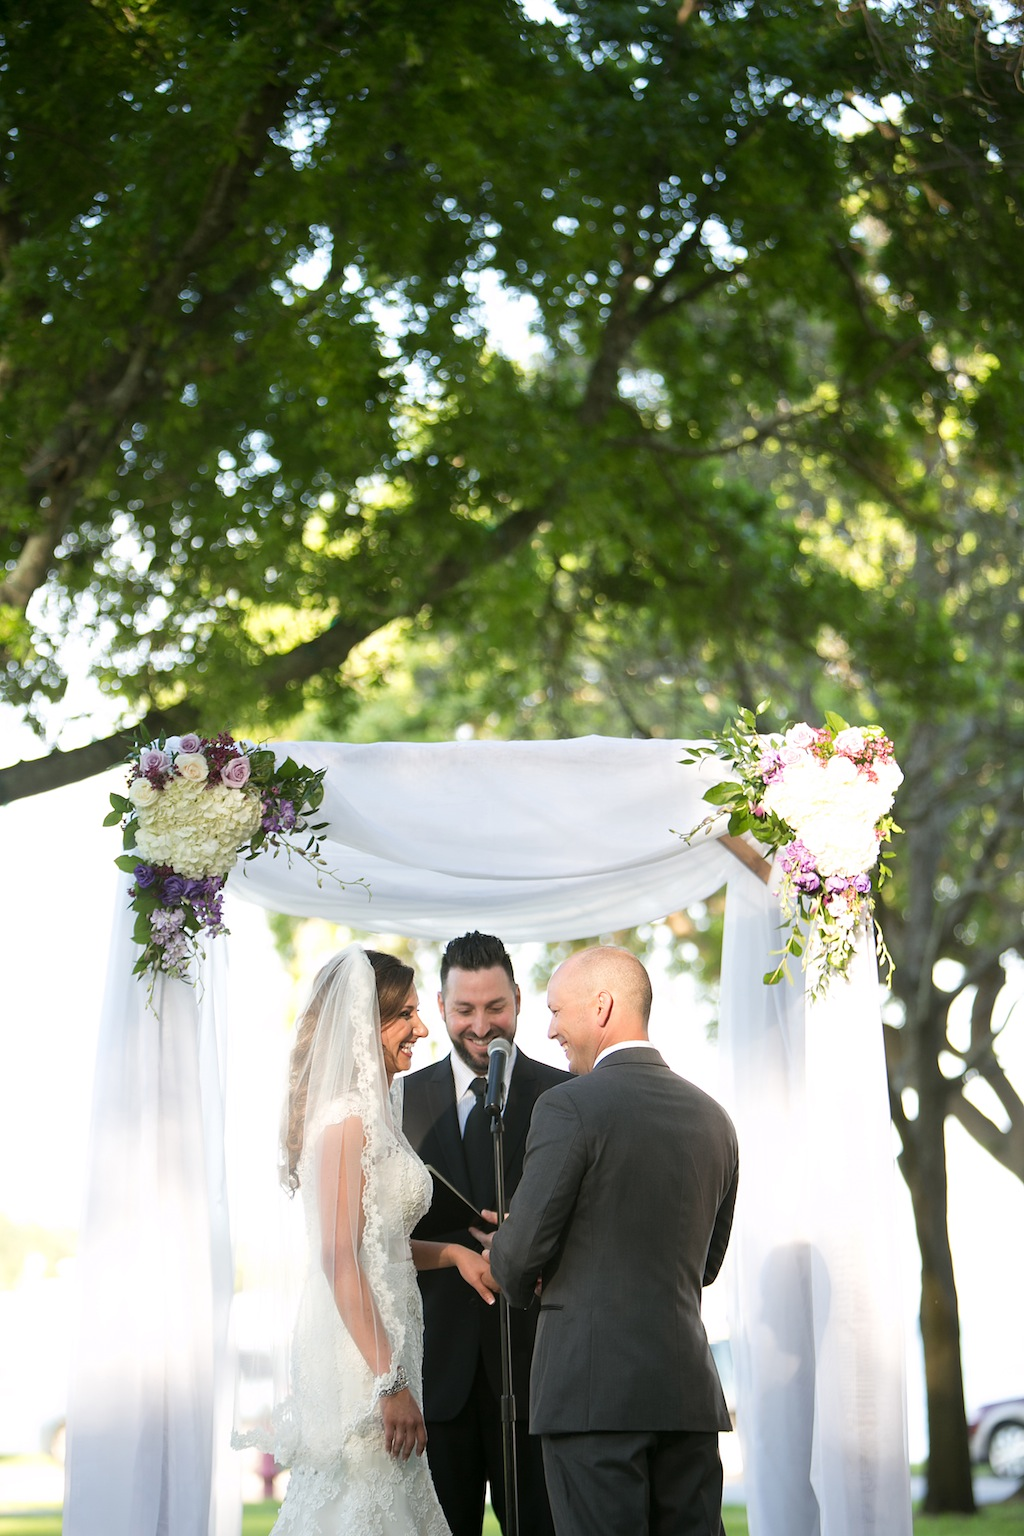 Downtown St. Pete Wedding - Birchwood Wedding - North Straub Park Wedding - Jenn Hopkins Photography (35)